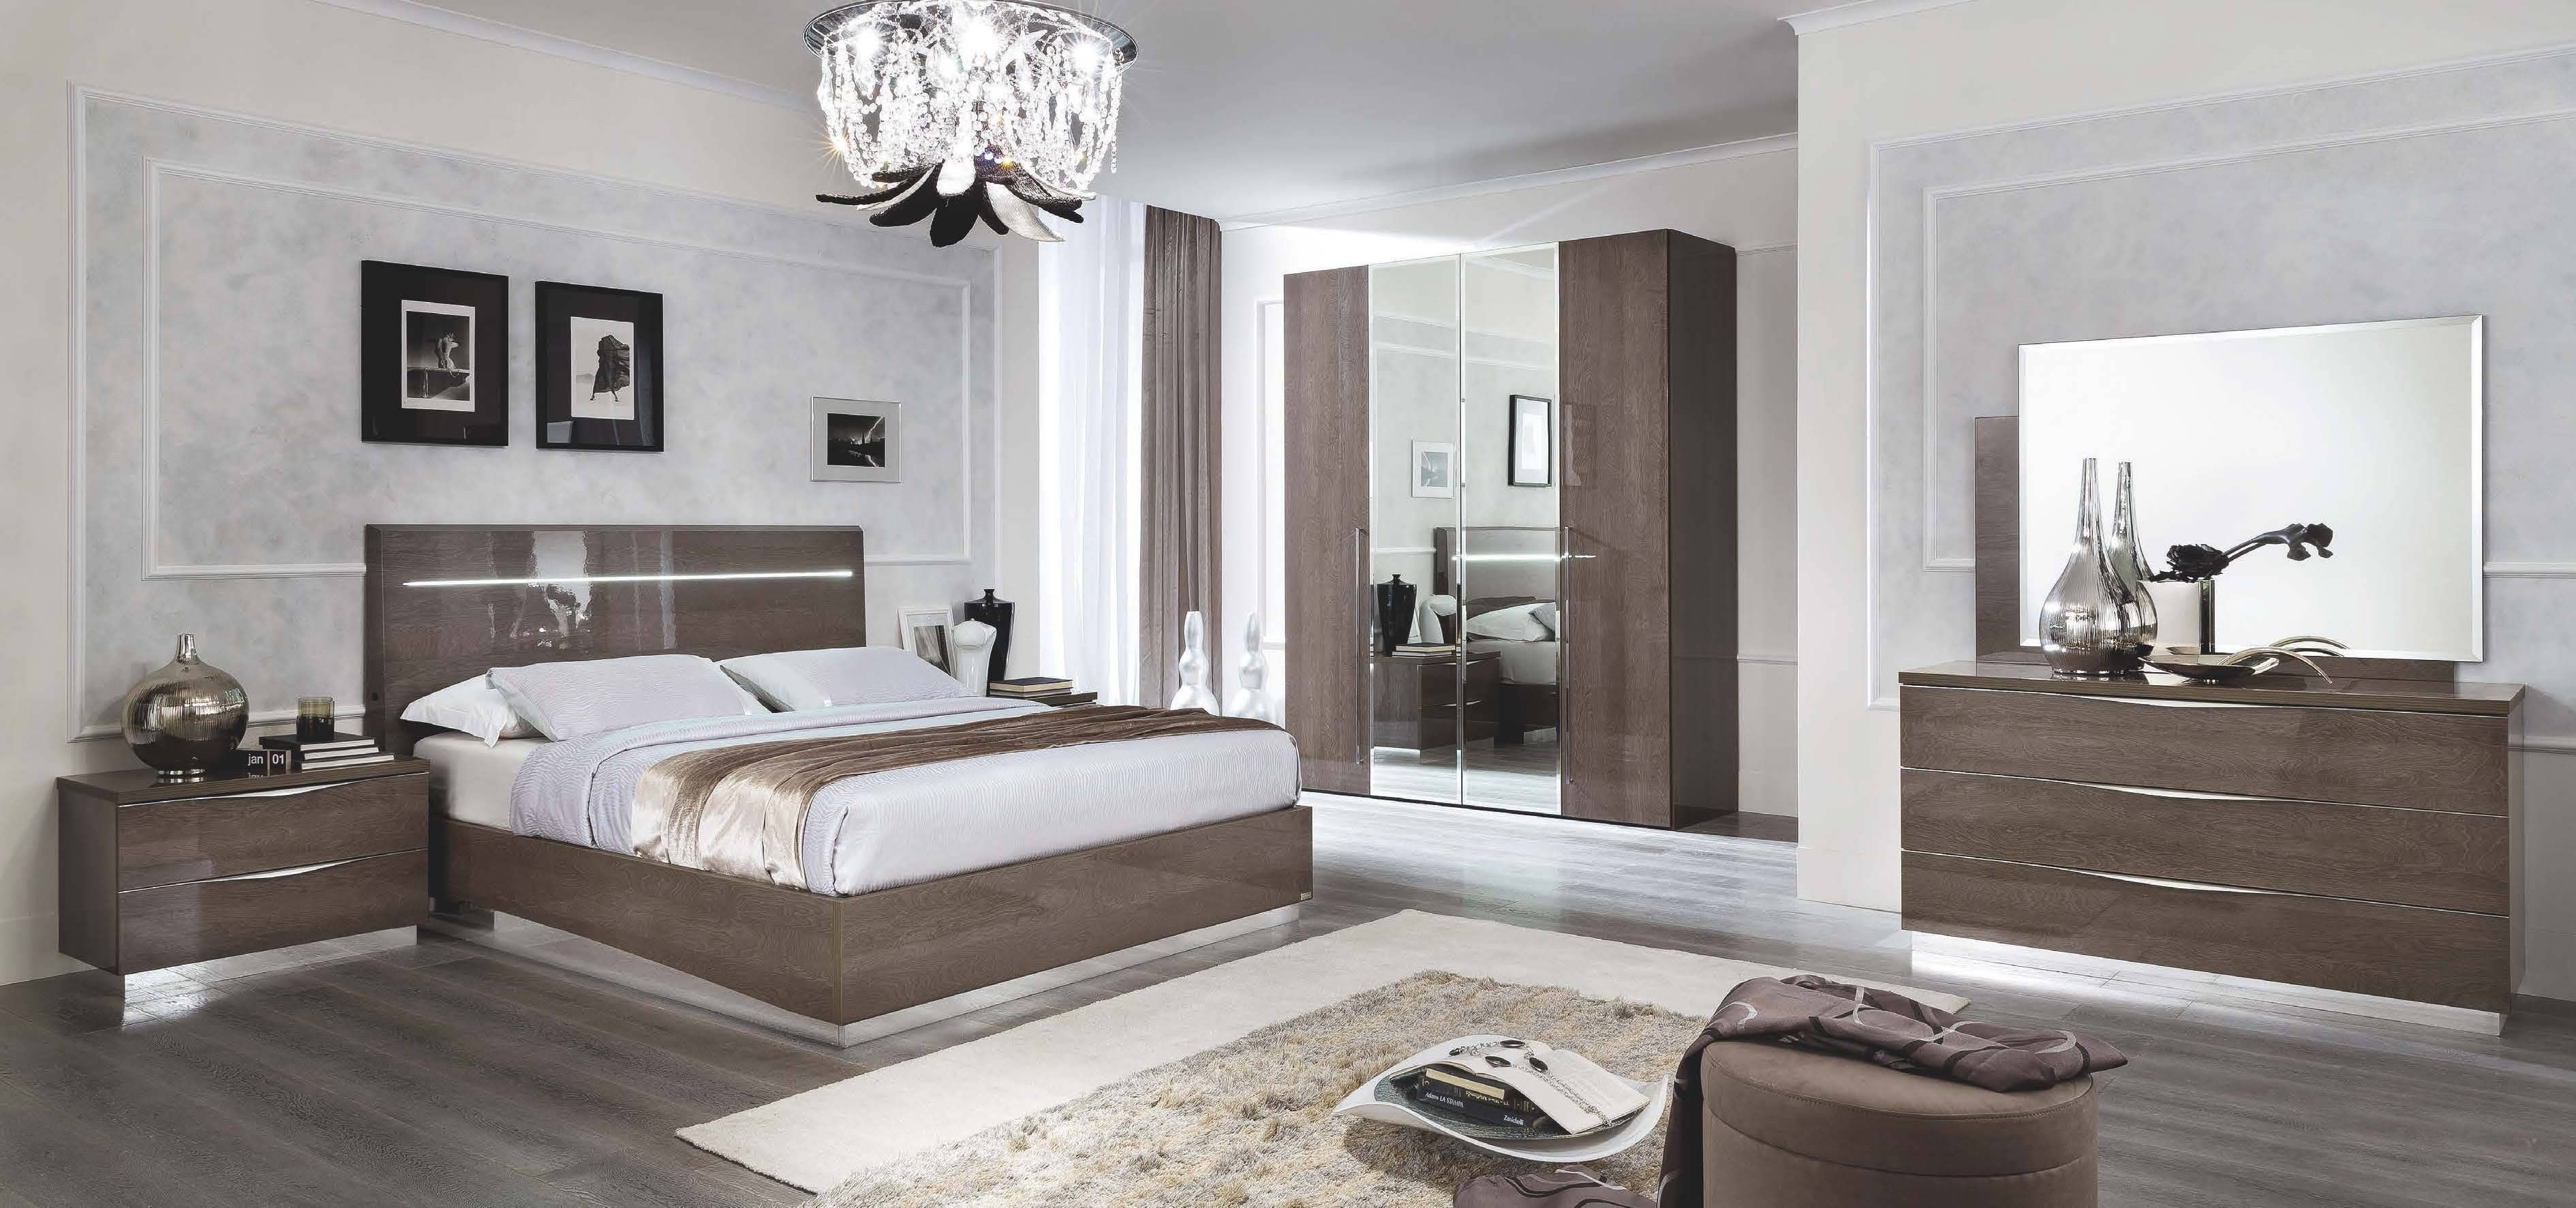 Italian Modern Bedroom Furniture Elegant Made In Italy